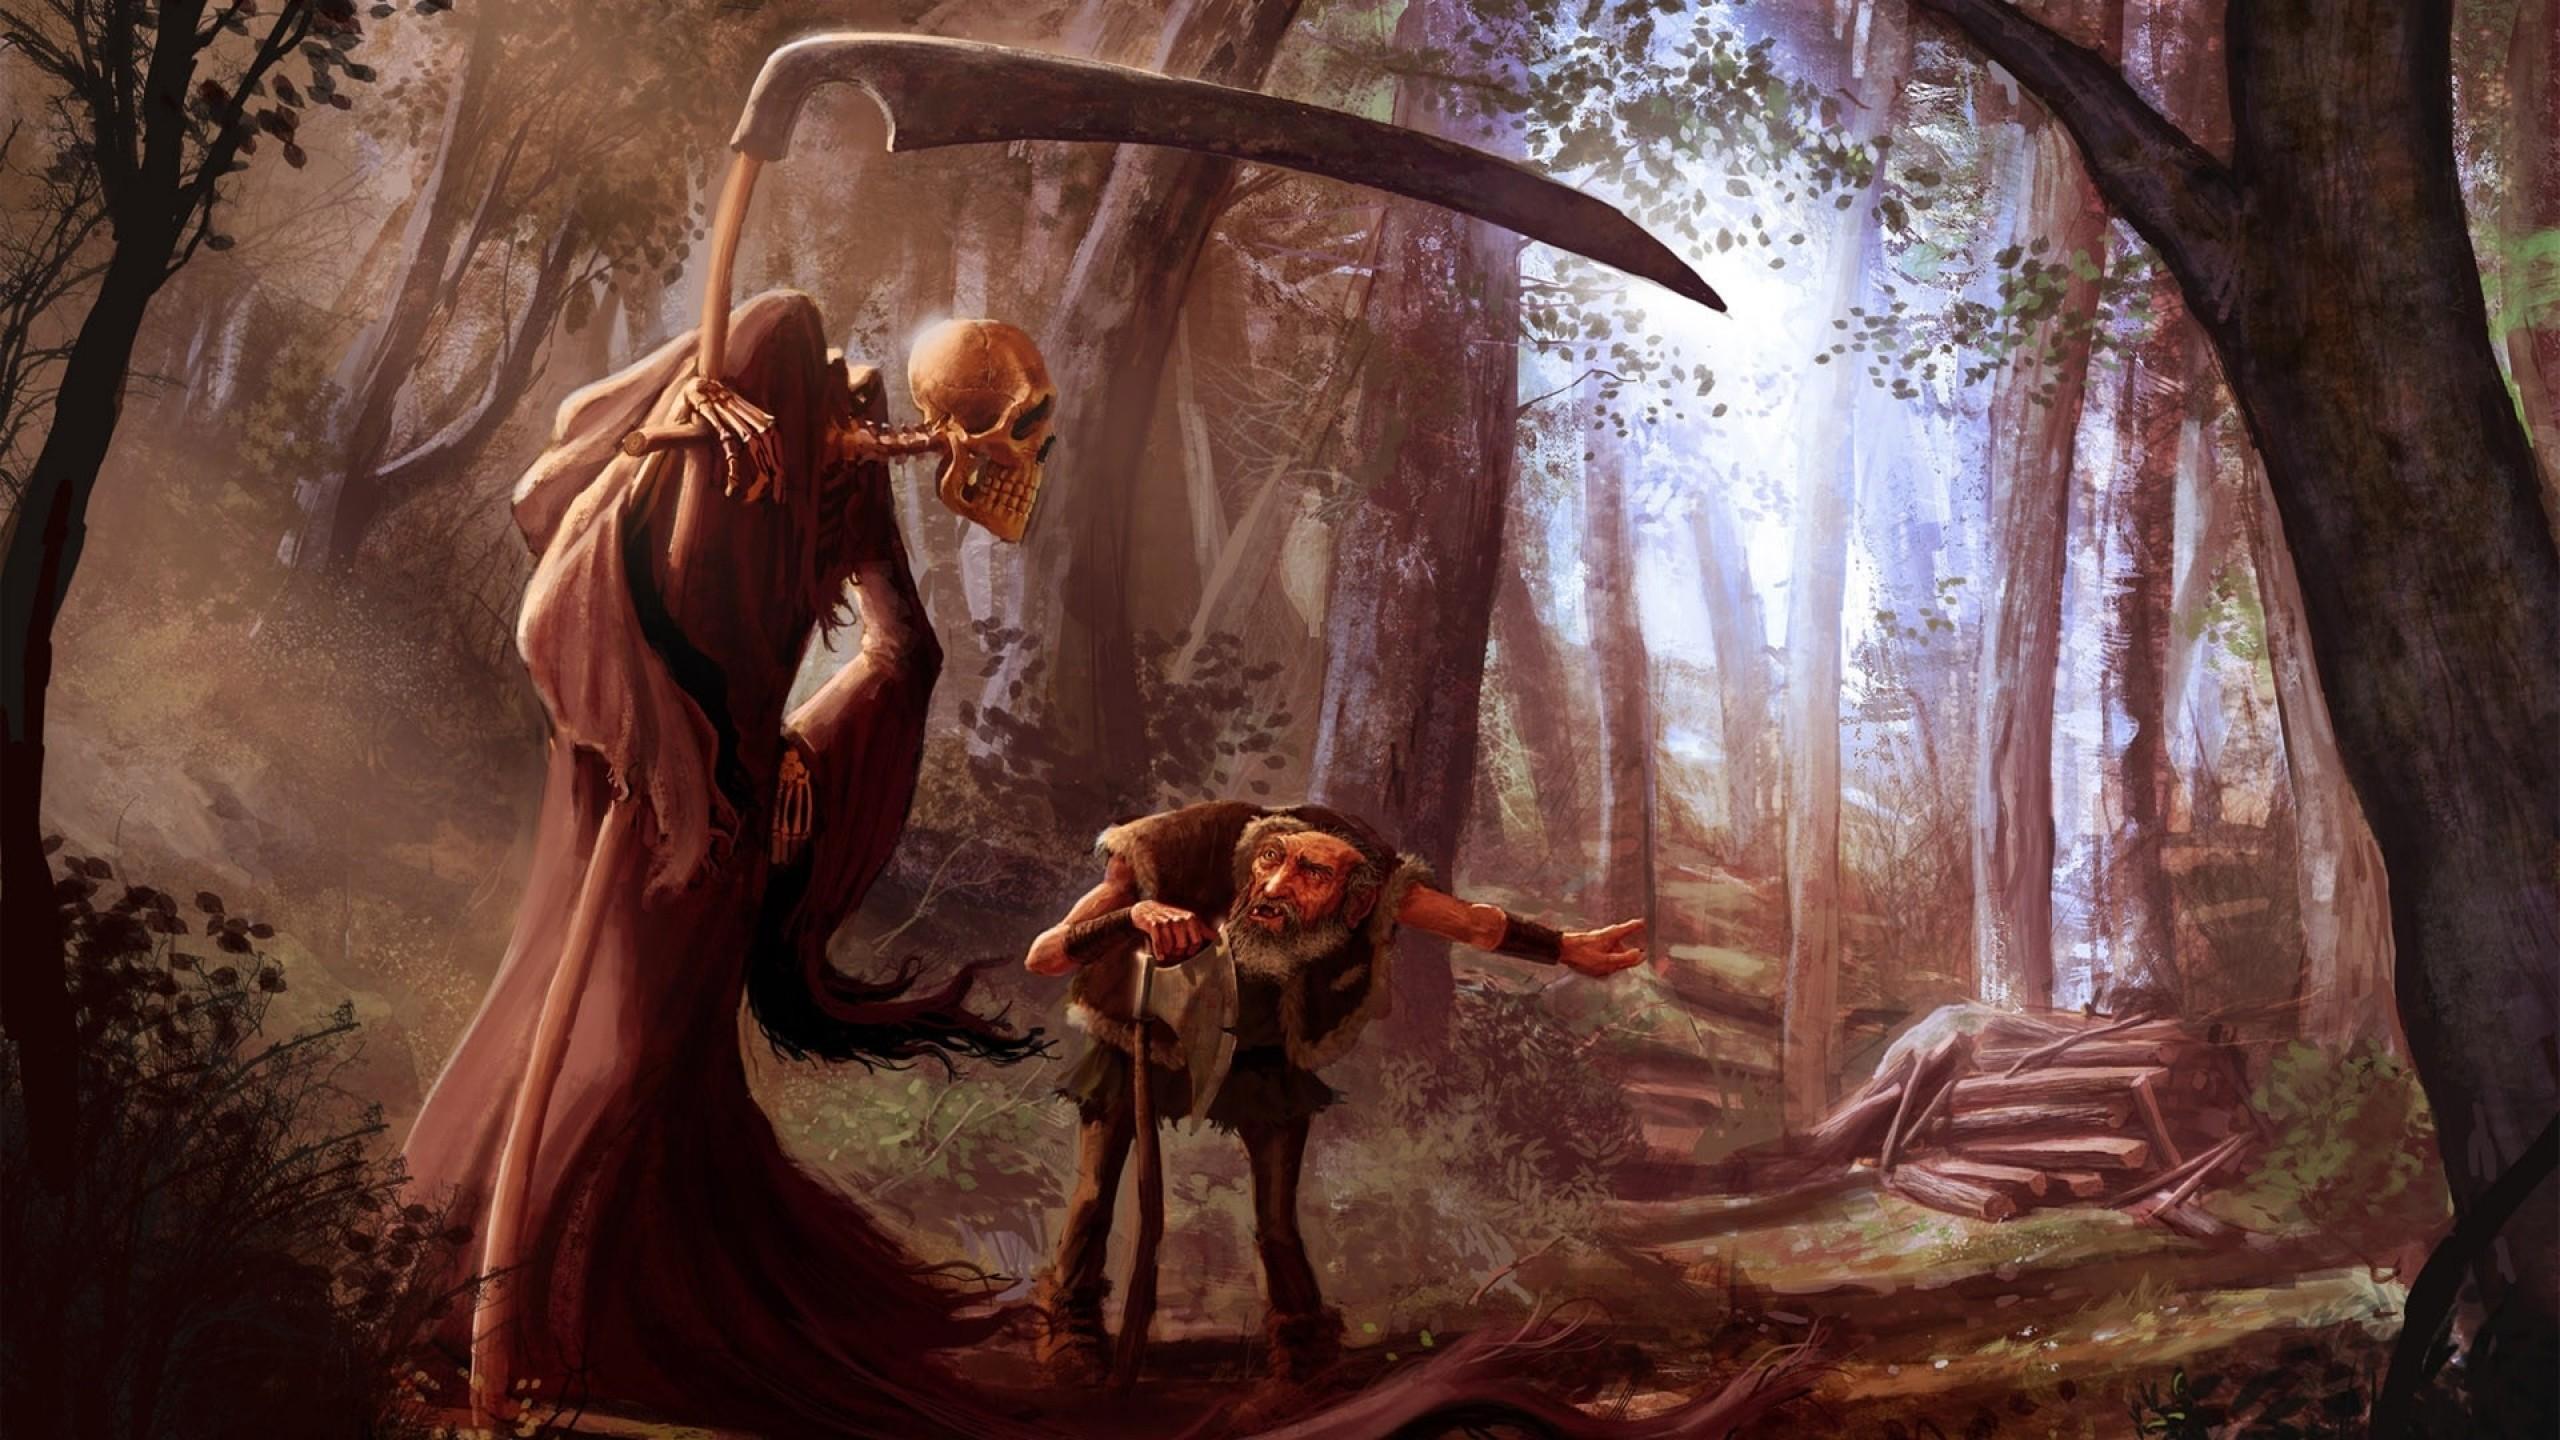 death grim reaper scythe axes realistic 1920×1080 wallpaper Art HD Wallpaper